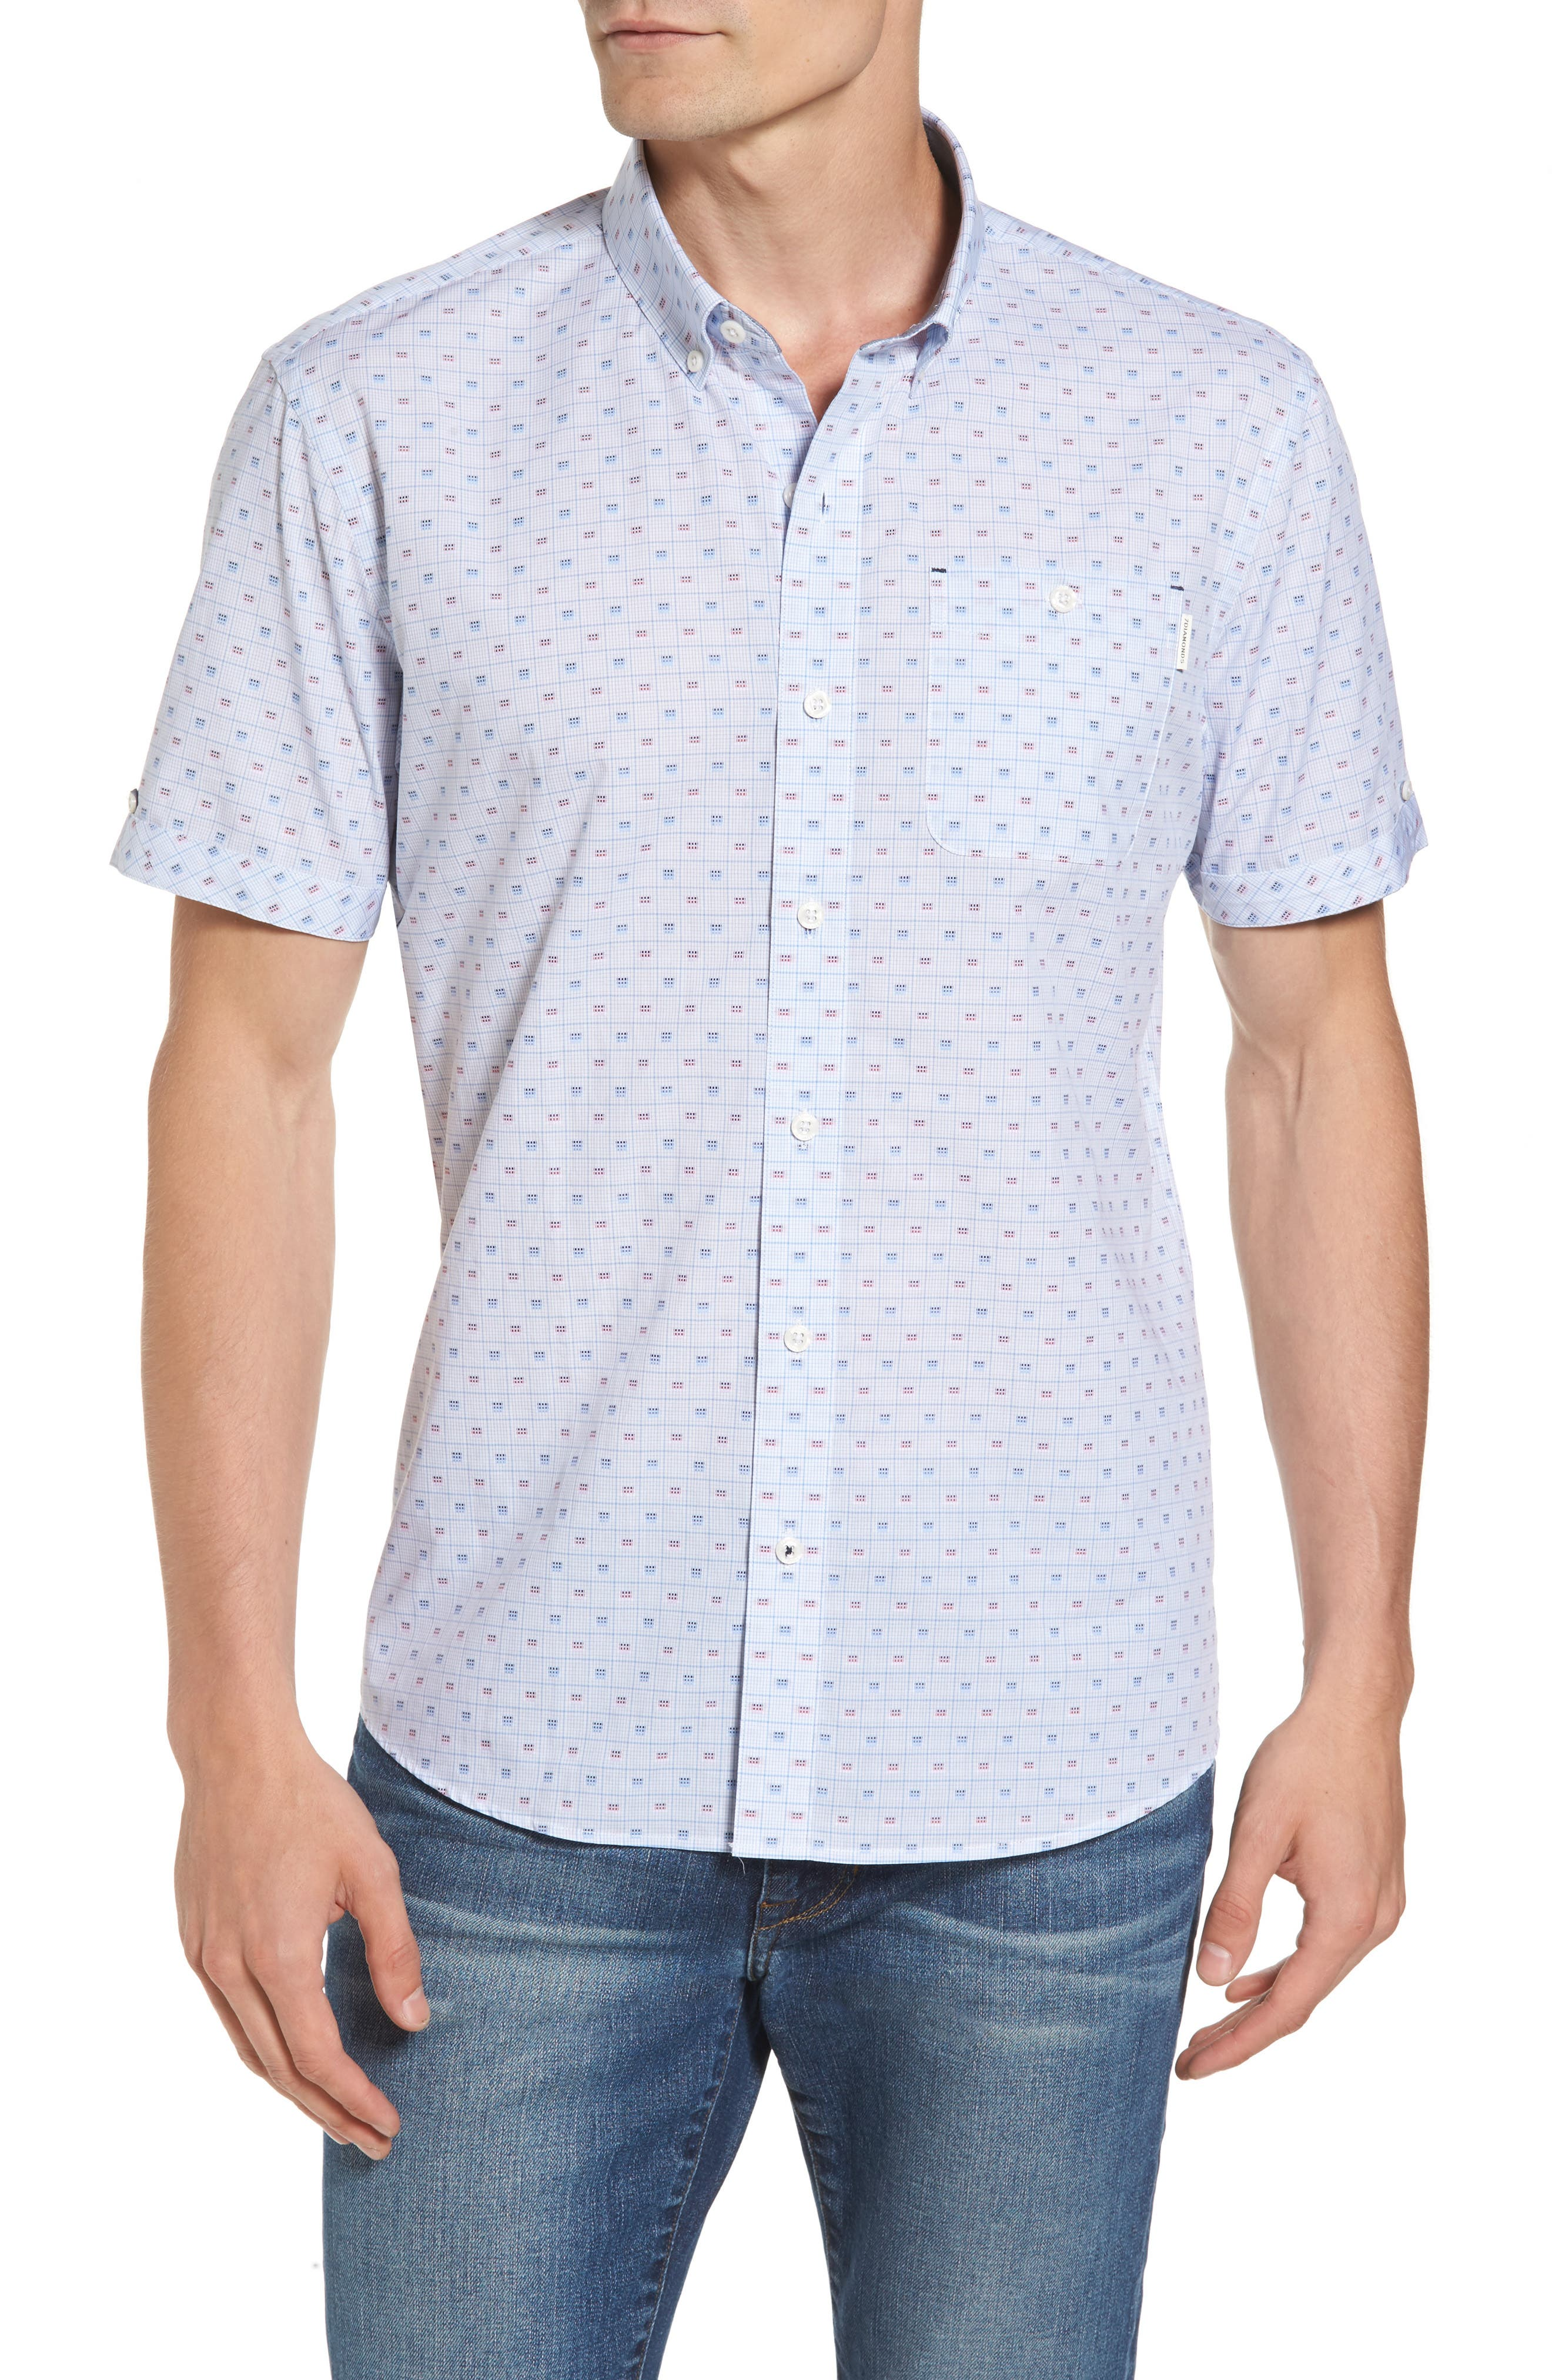 7 Diamonds Atmosphere Woven Shirt